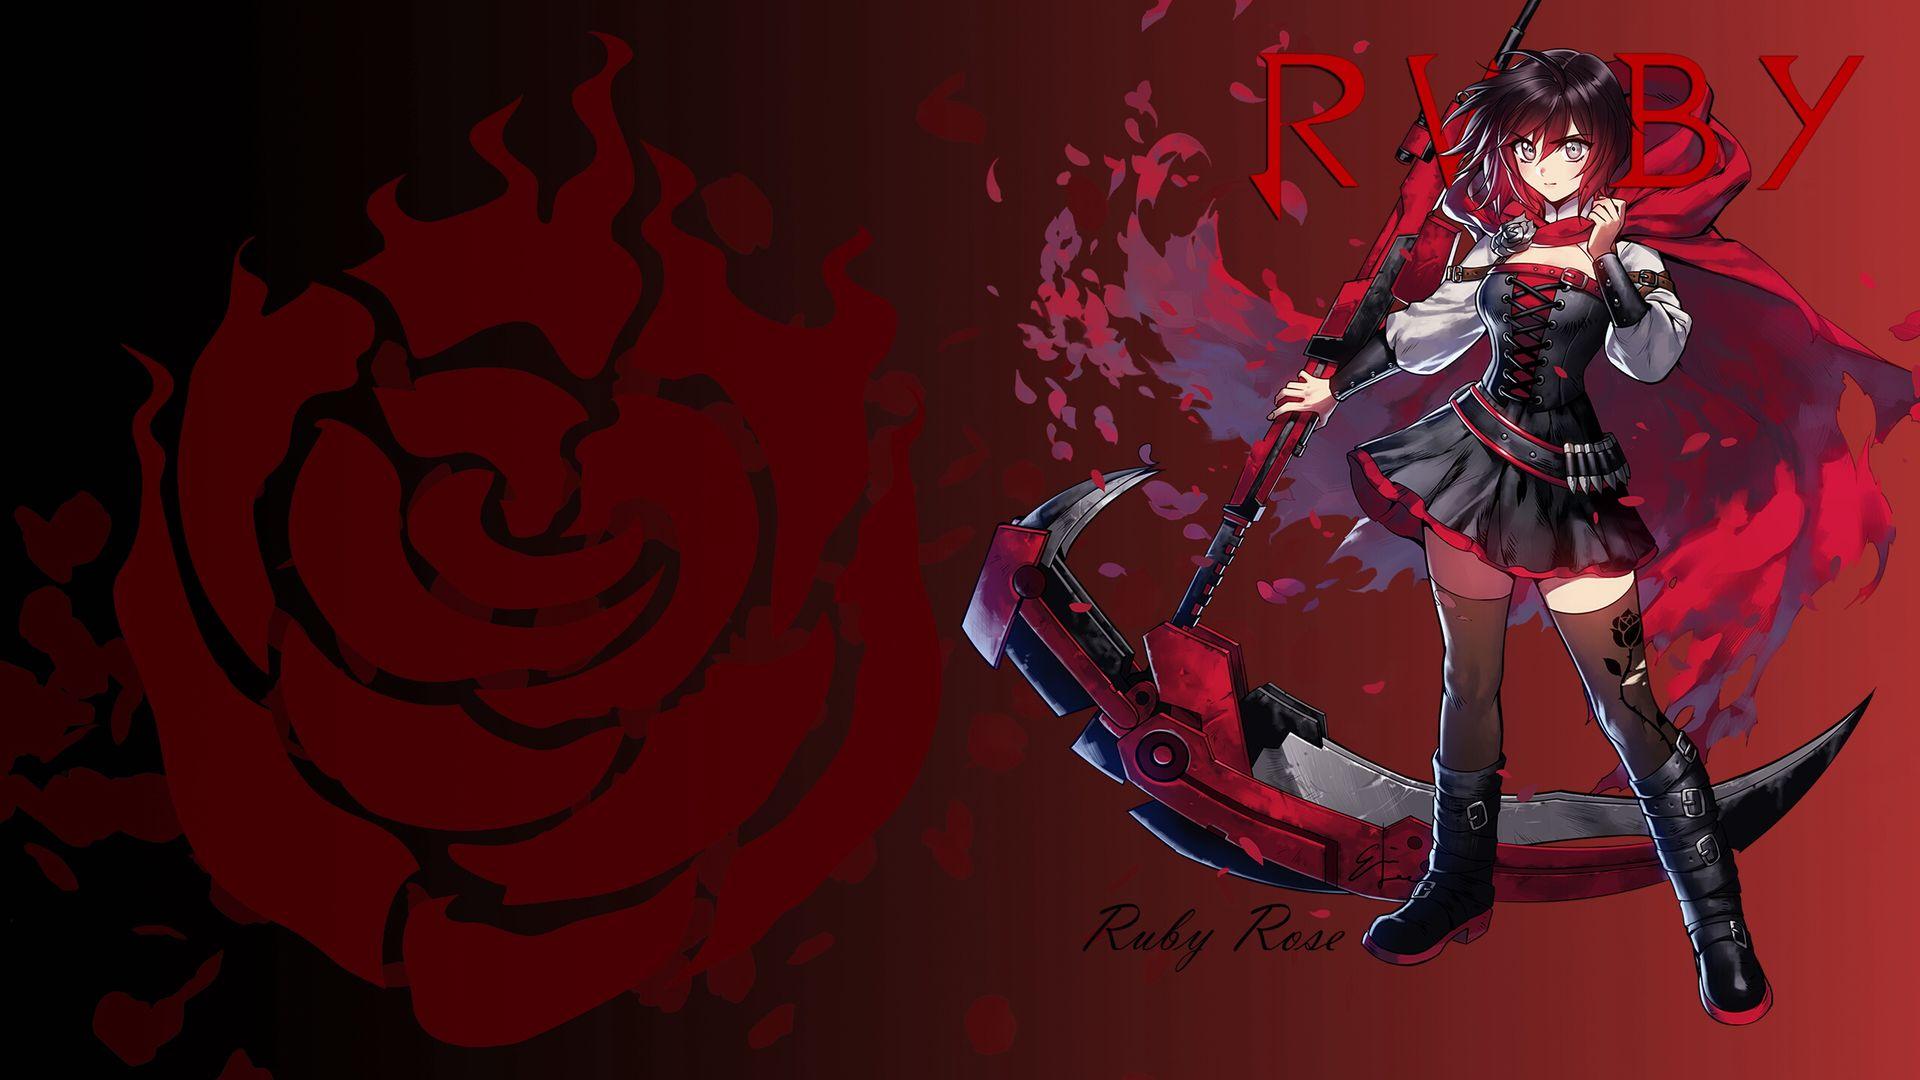 The Black Rose - Ruby Rose Bio - Wattpad